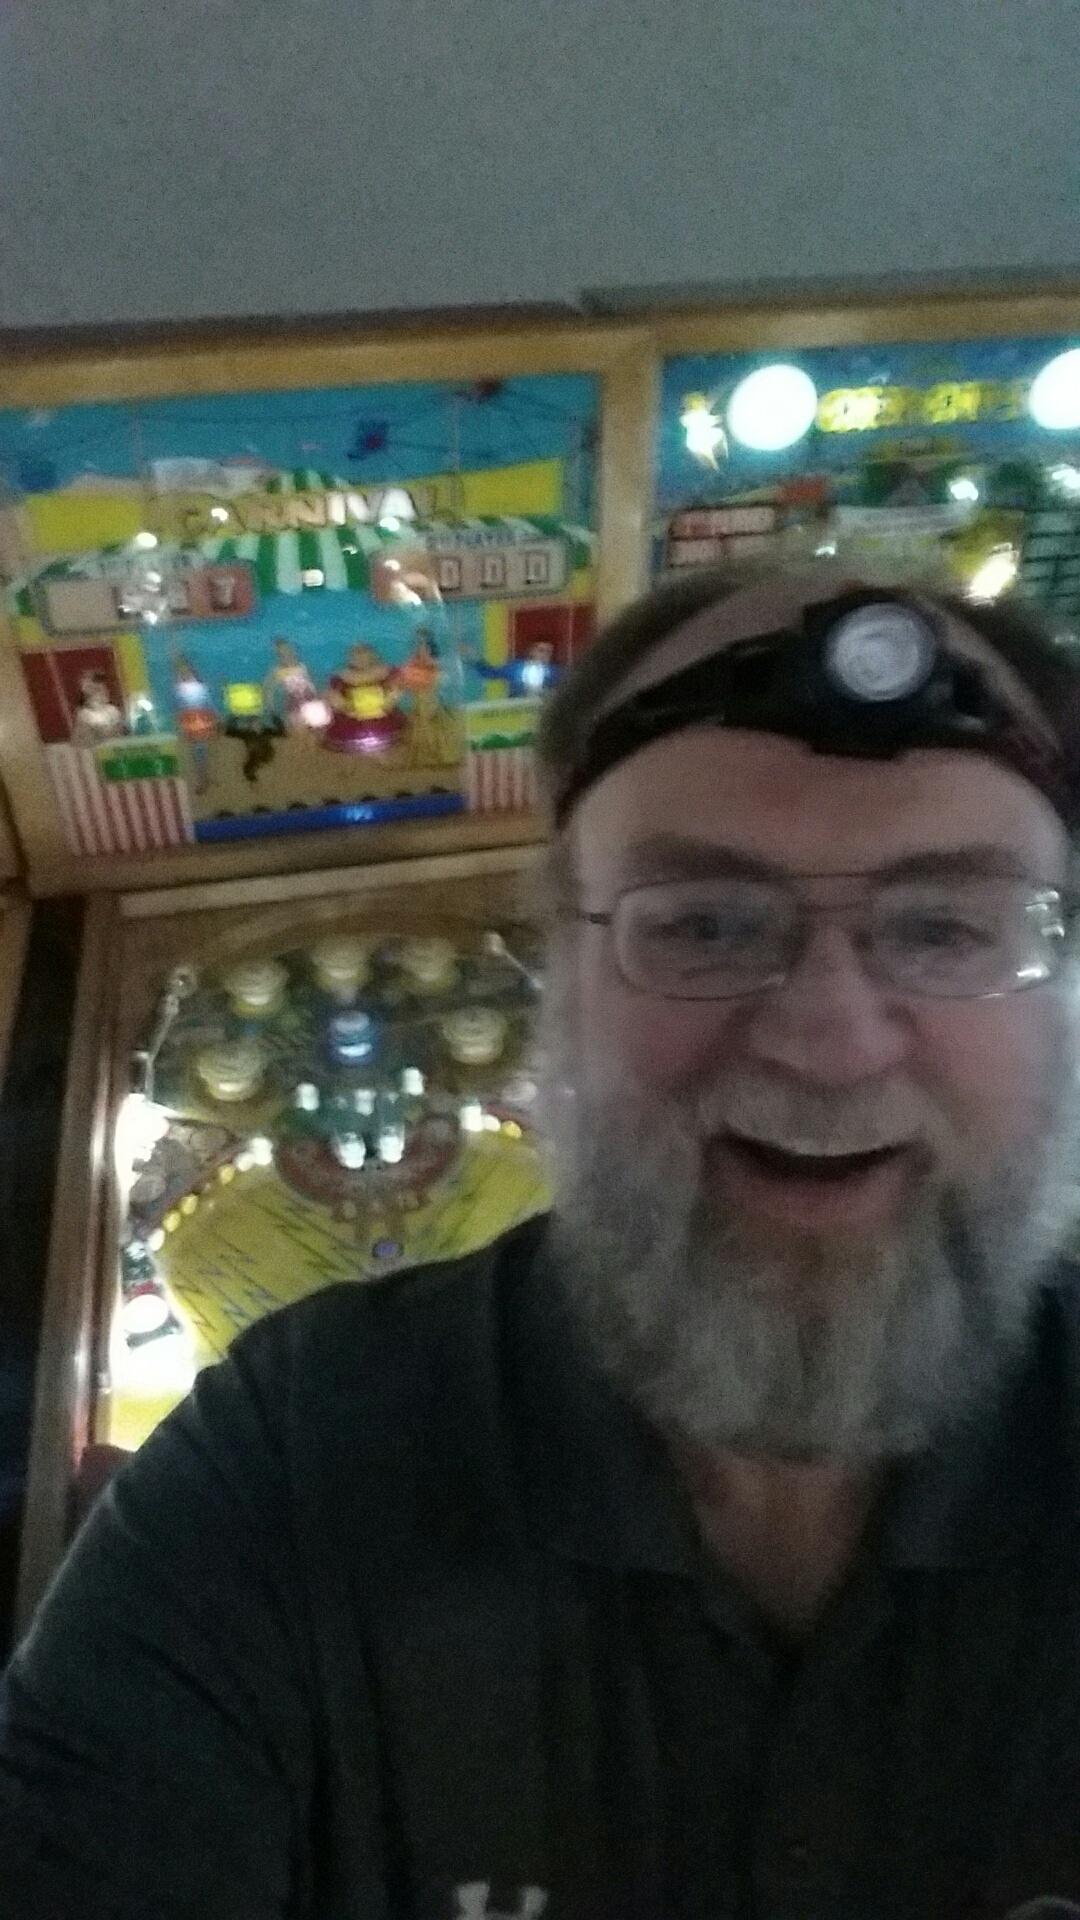 Carnival [1957 Pinball] 887 points